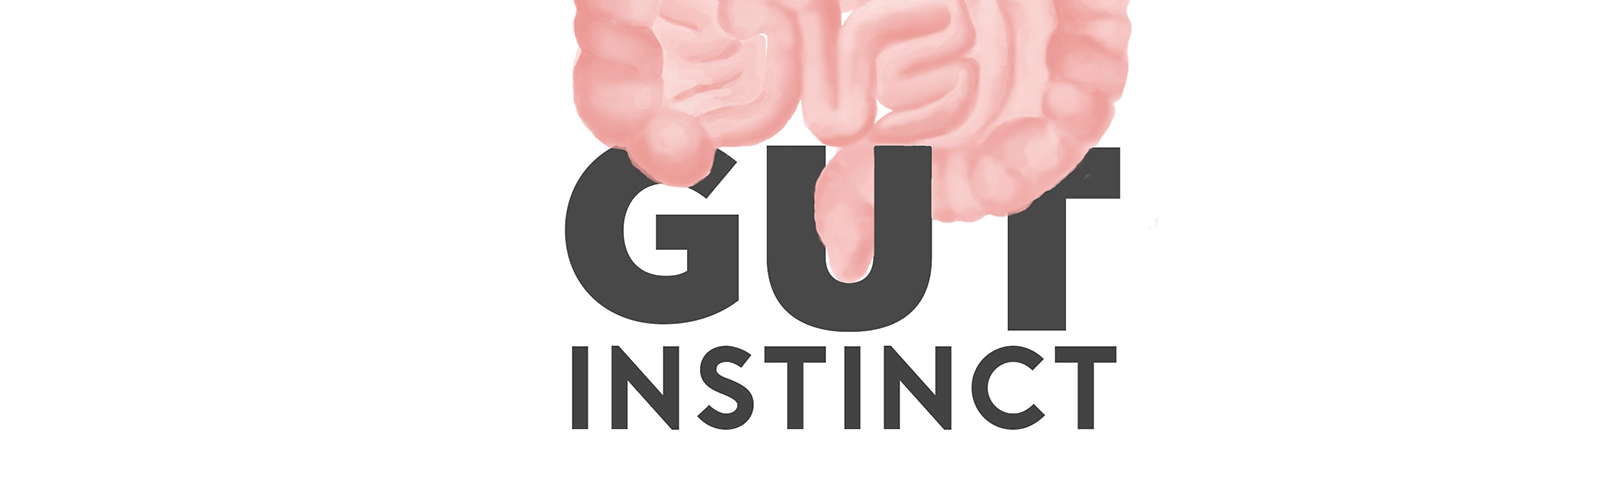 Gut Instinct logo